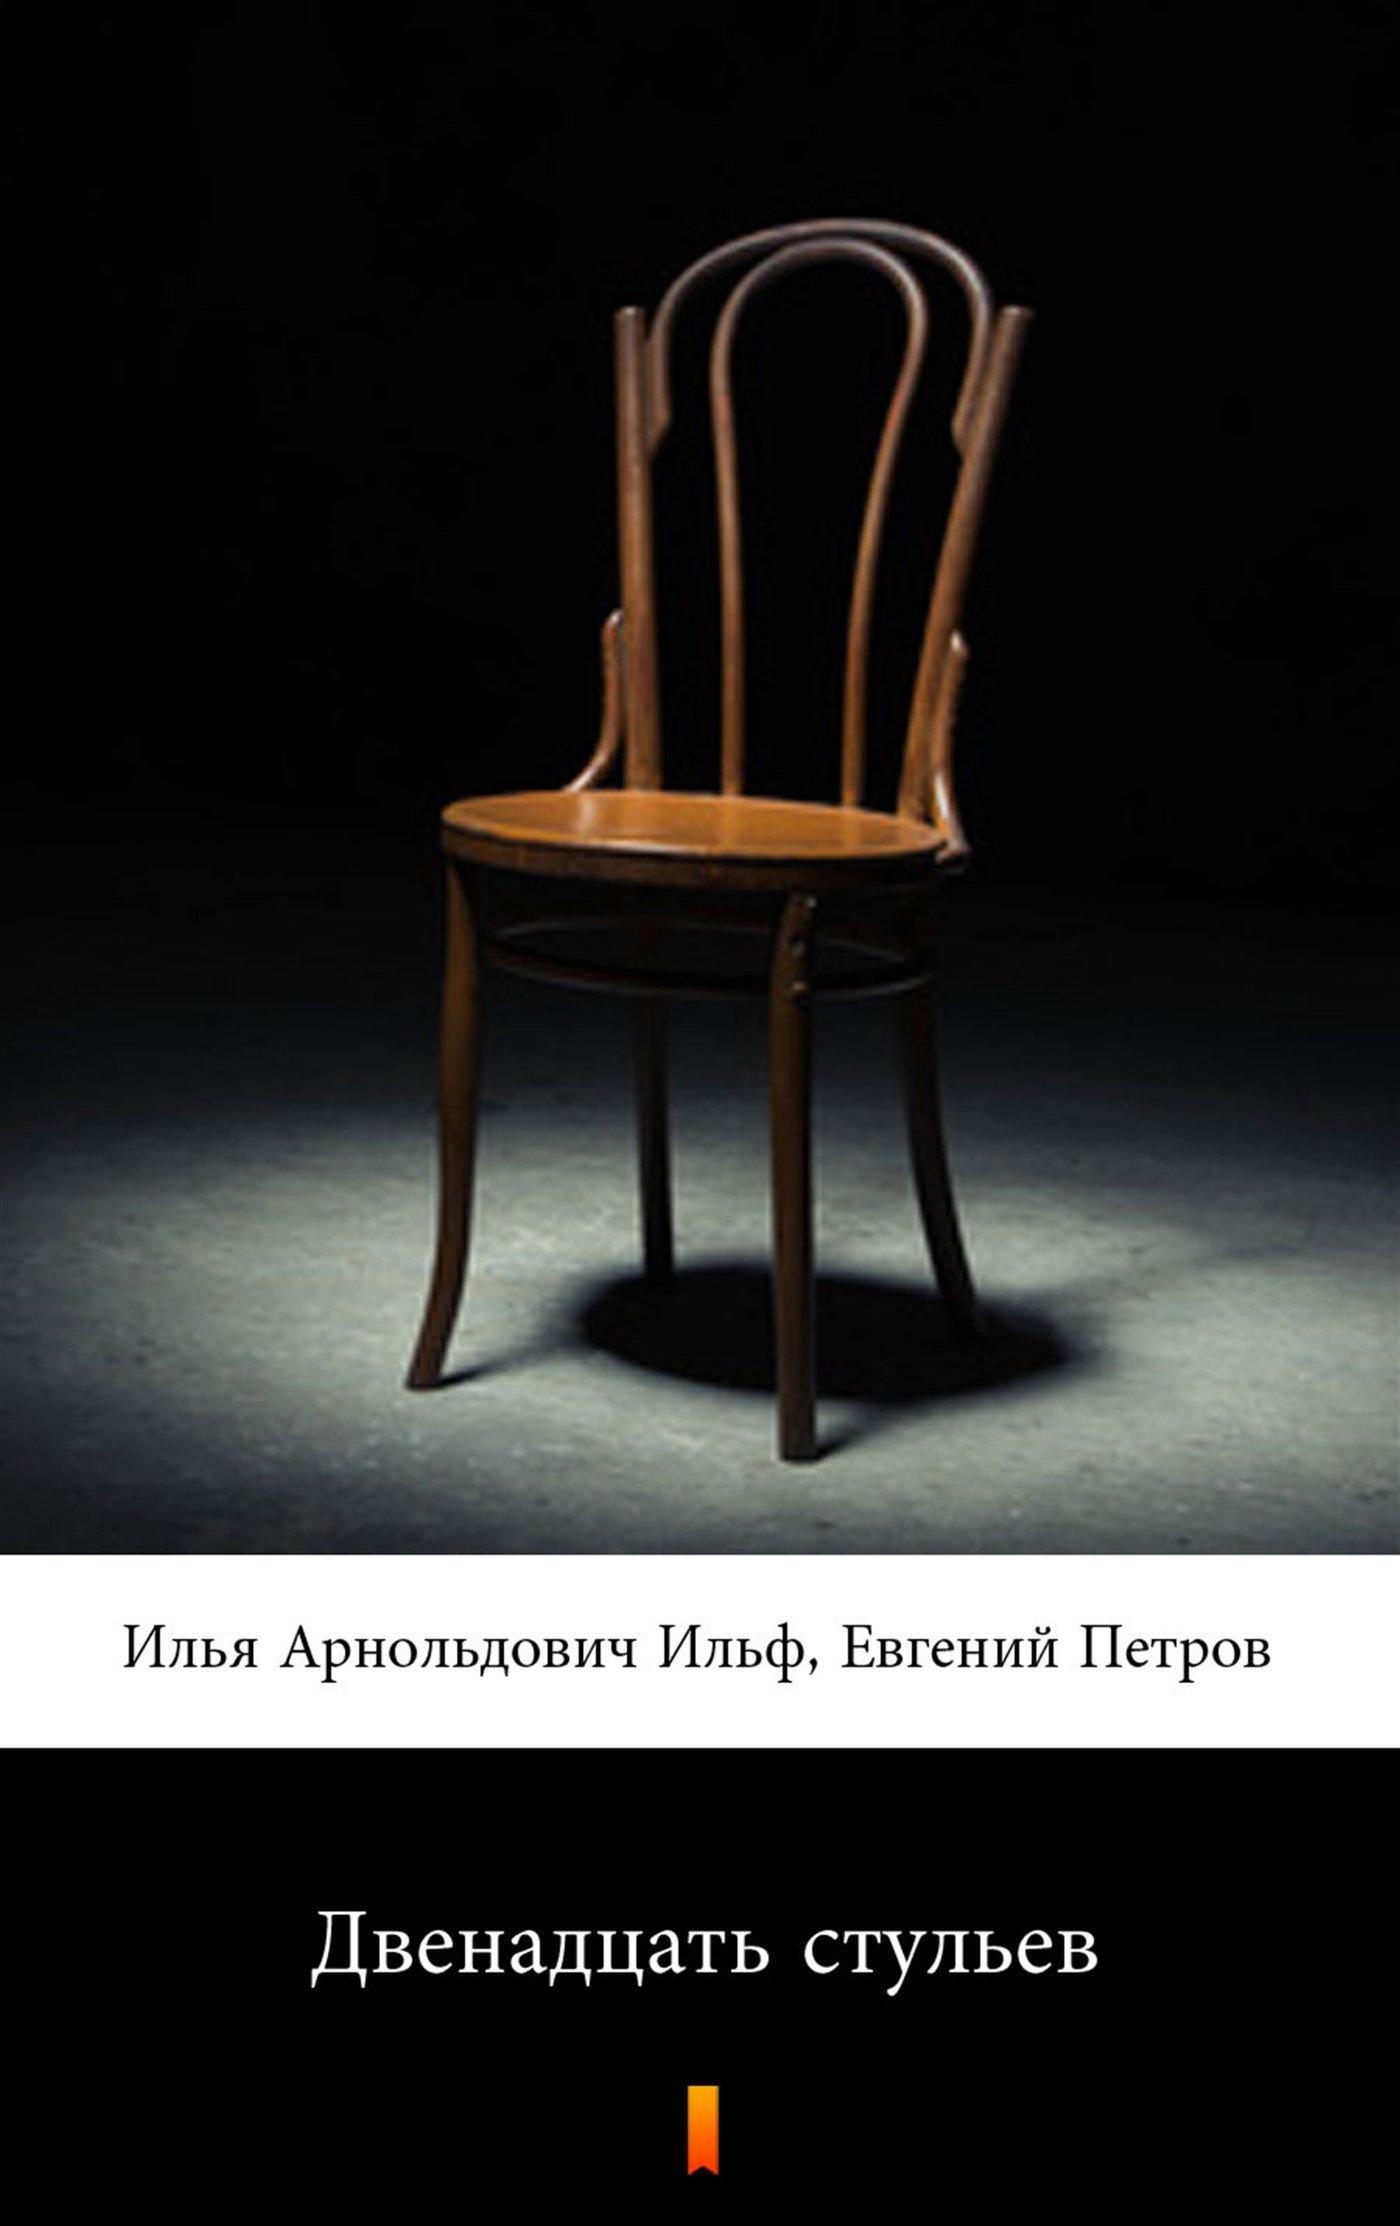 Двенадцать стульев - Ebook (Książka na Kindle) do pobrania w formacie MOBI